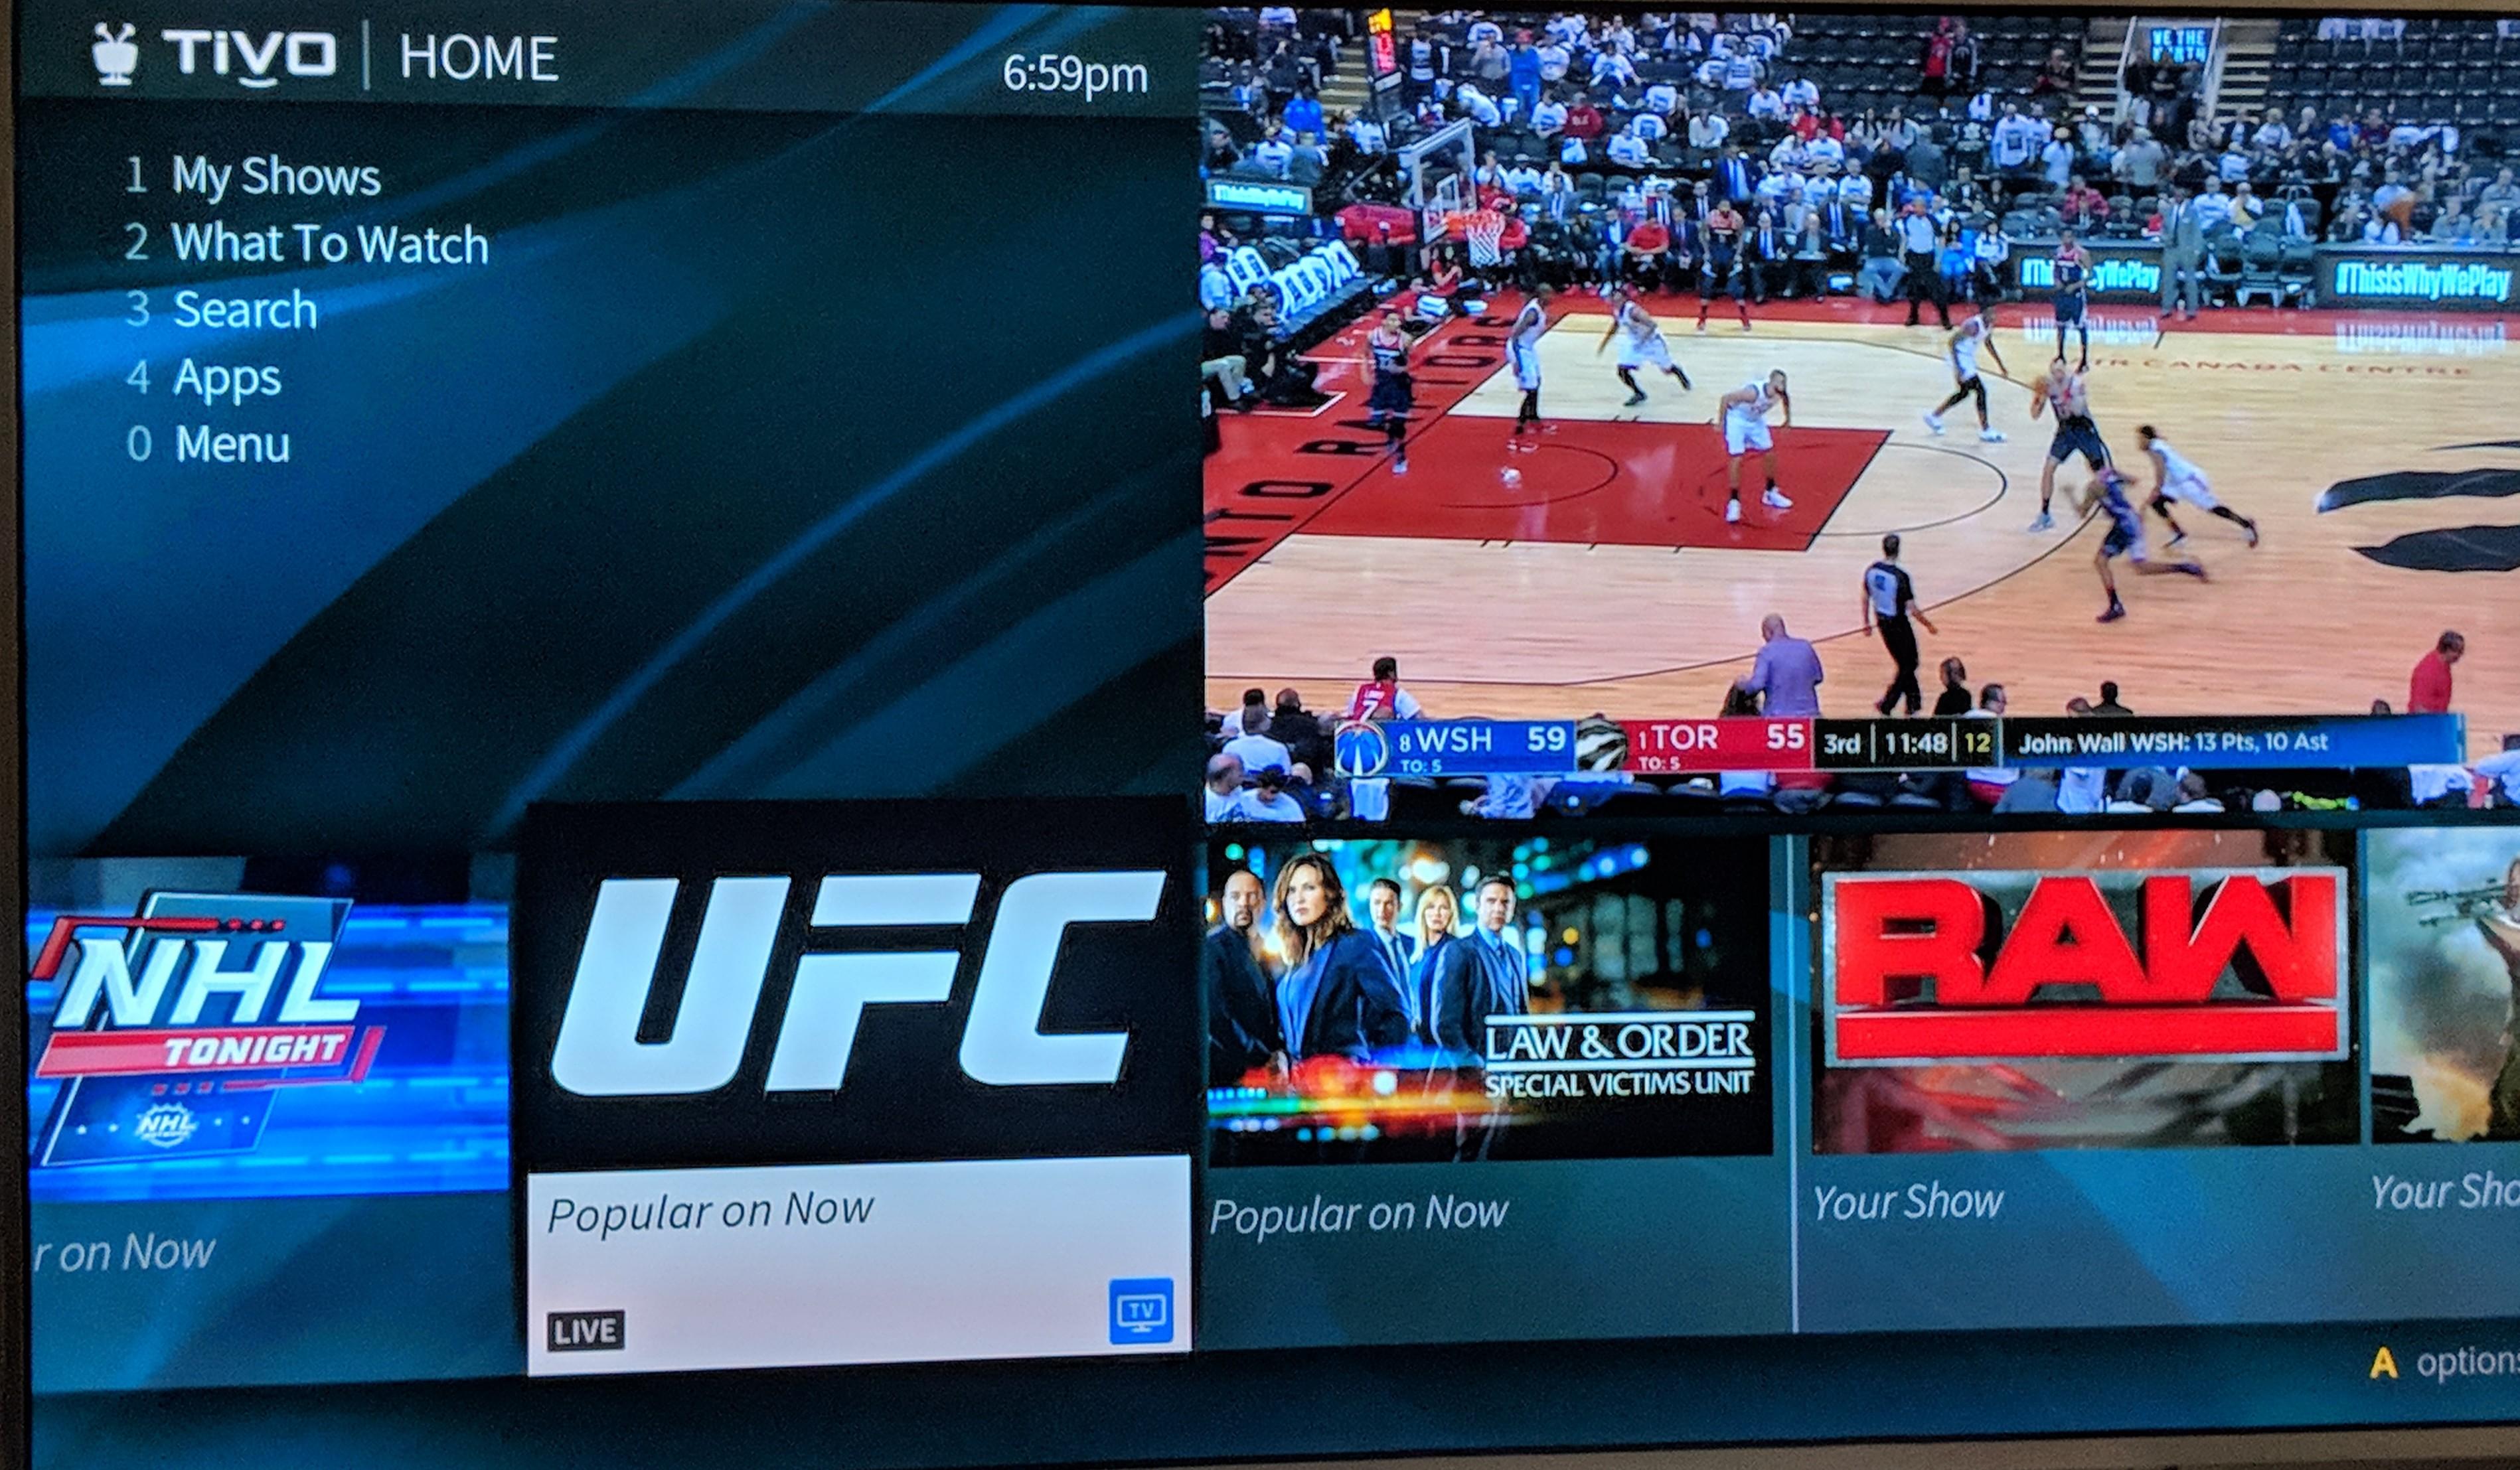 TiVo Bolt Vox DVR Review – The Ultimate DVR but do you need